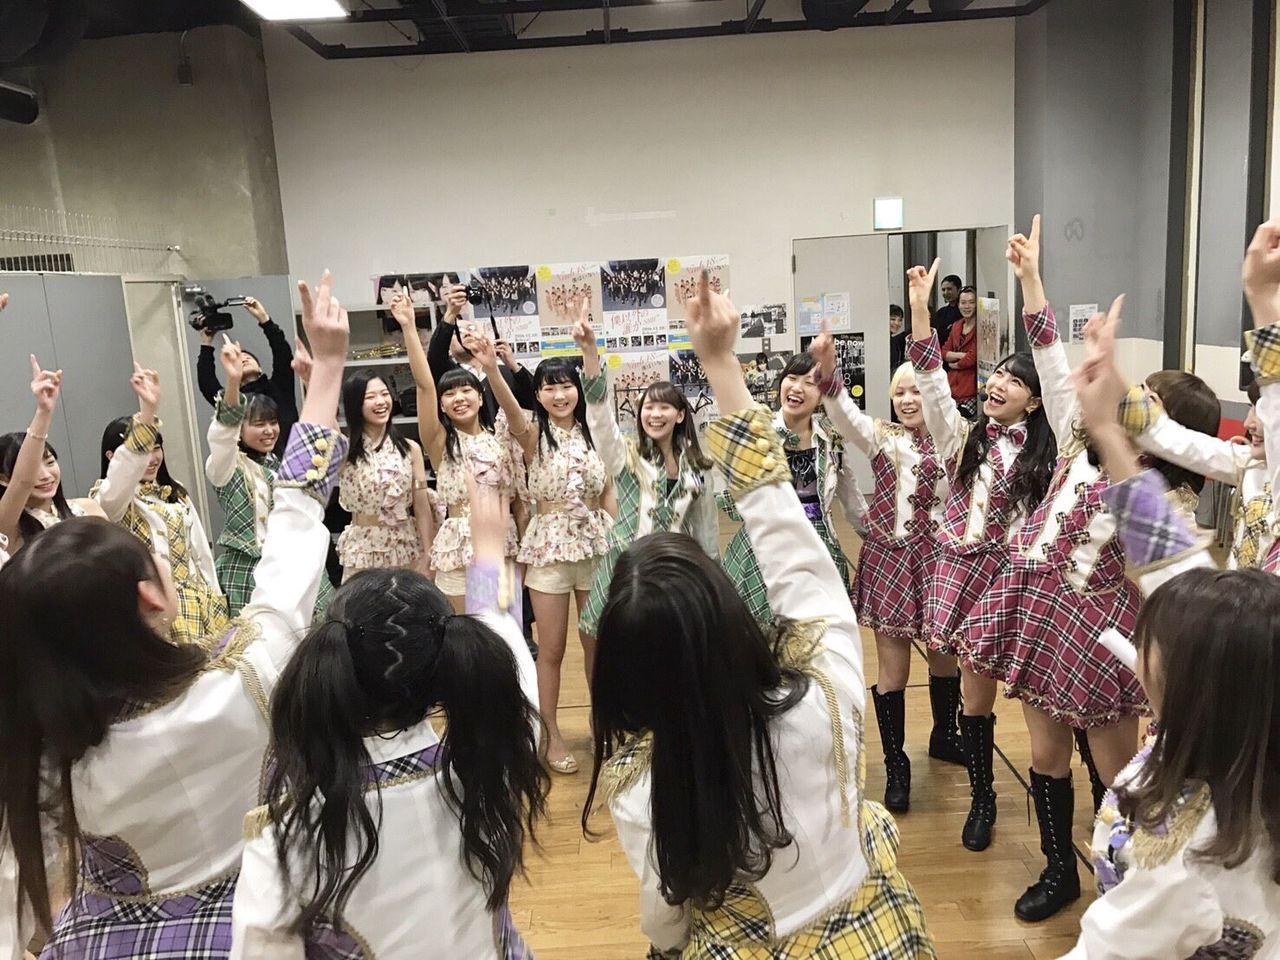 【NMB48】チームMの円陣に微笑むダンスの先生wwwwwwwww